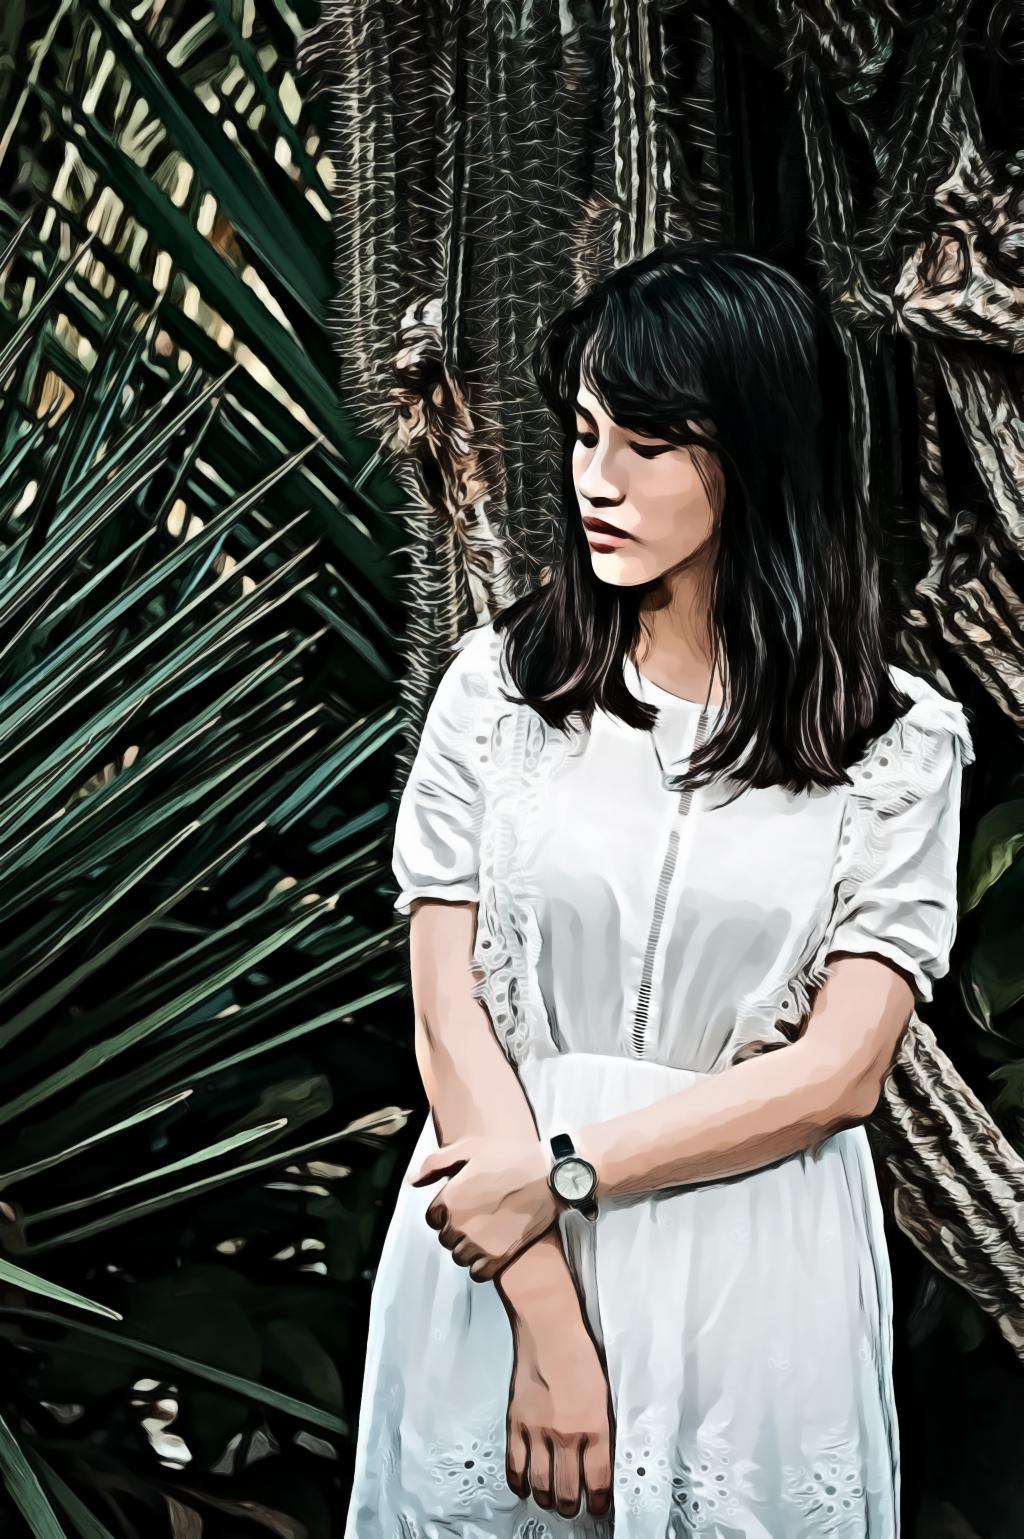 Woman wearing a teal half sleeved dress standing beside green plant